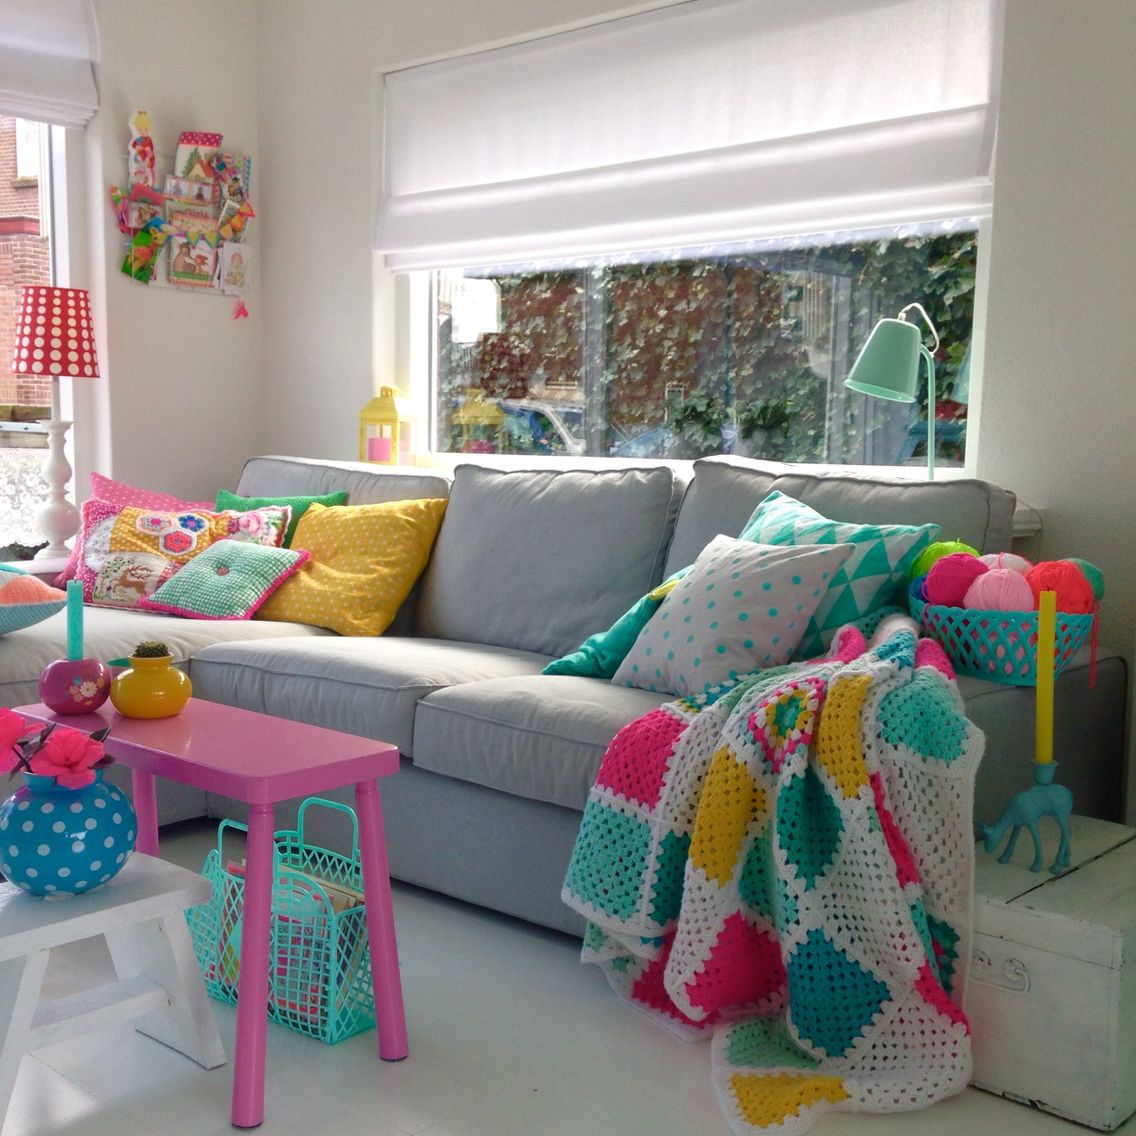 Home and Crochet work by Studio Hip en Stip | インテリア | Pinterest ...